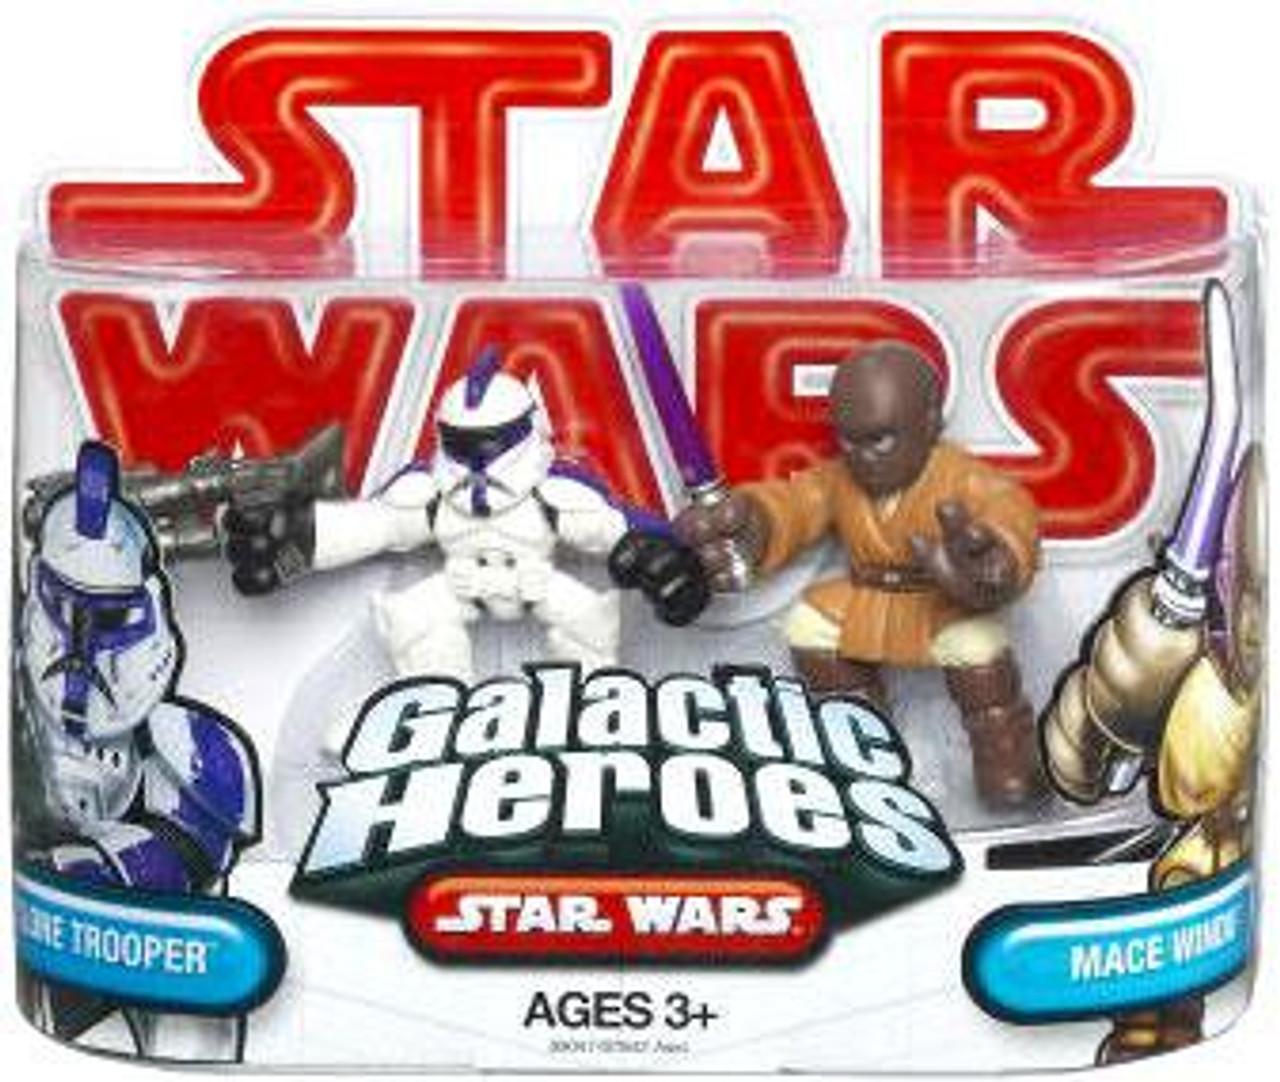 Star Wars Attack of the Clones Galactic Heroes 2009 Assault Battalion Clone Trooper & Mace Windu Mini Figure 2-Pack